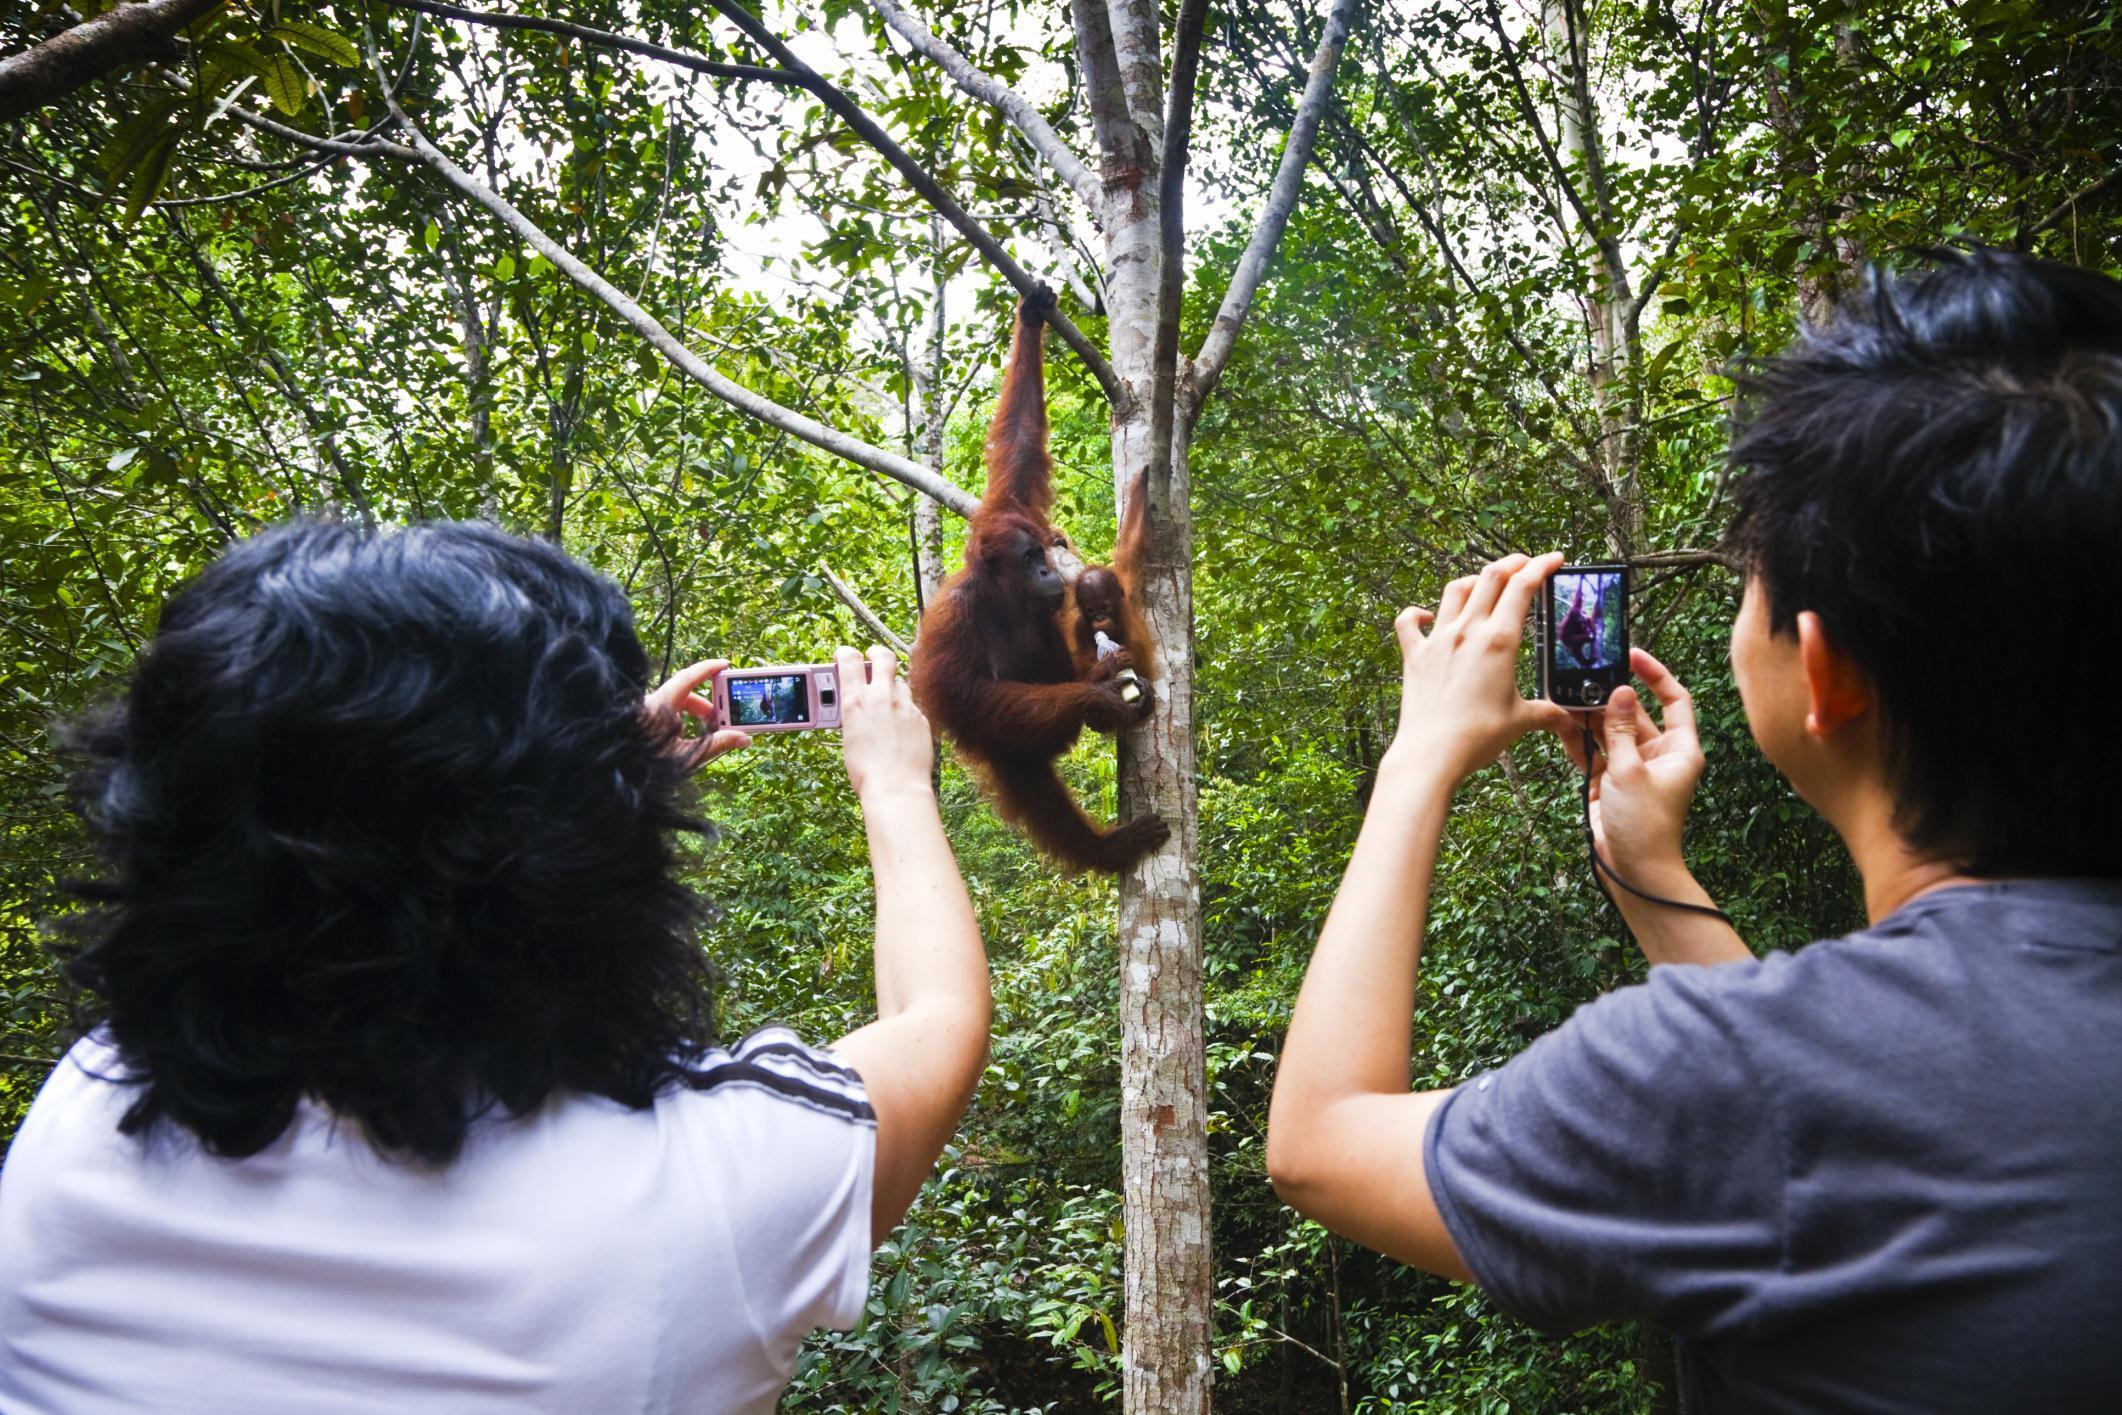 Turistas fotografiando un orangután (Pongo pygmaeus). Centro de Vida Silvestre Semenngoh. Kuching, Sarawak, Borneo, Malasia